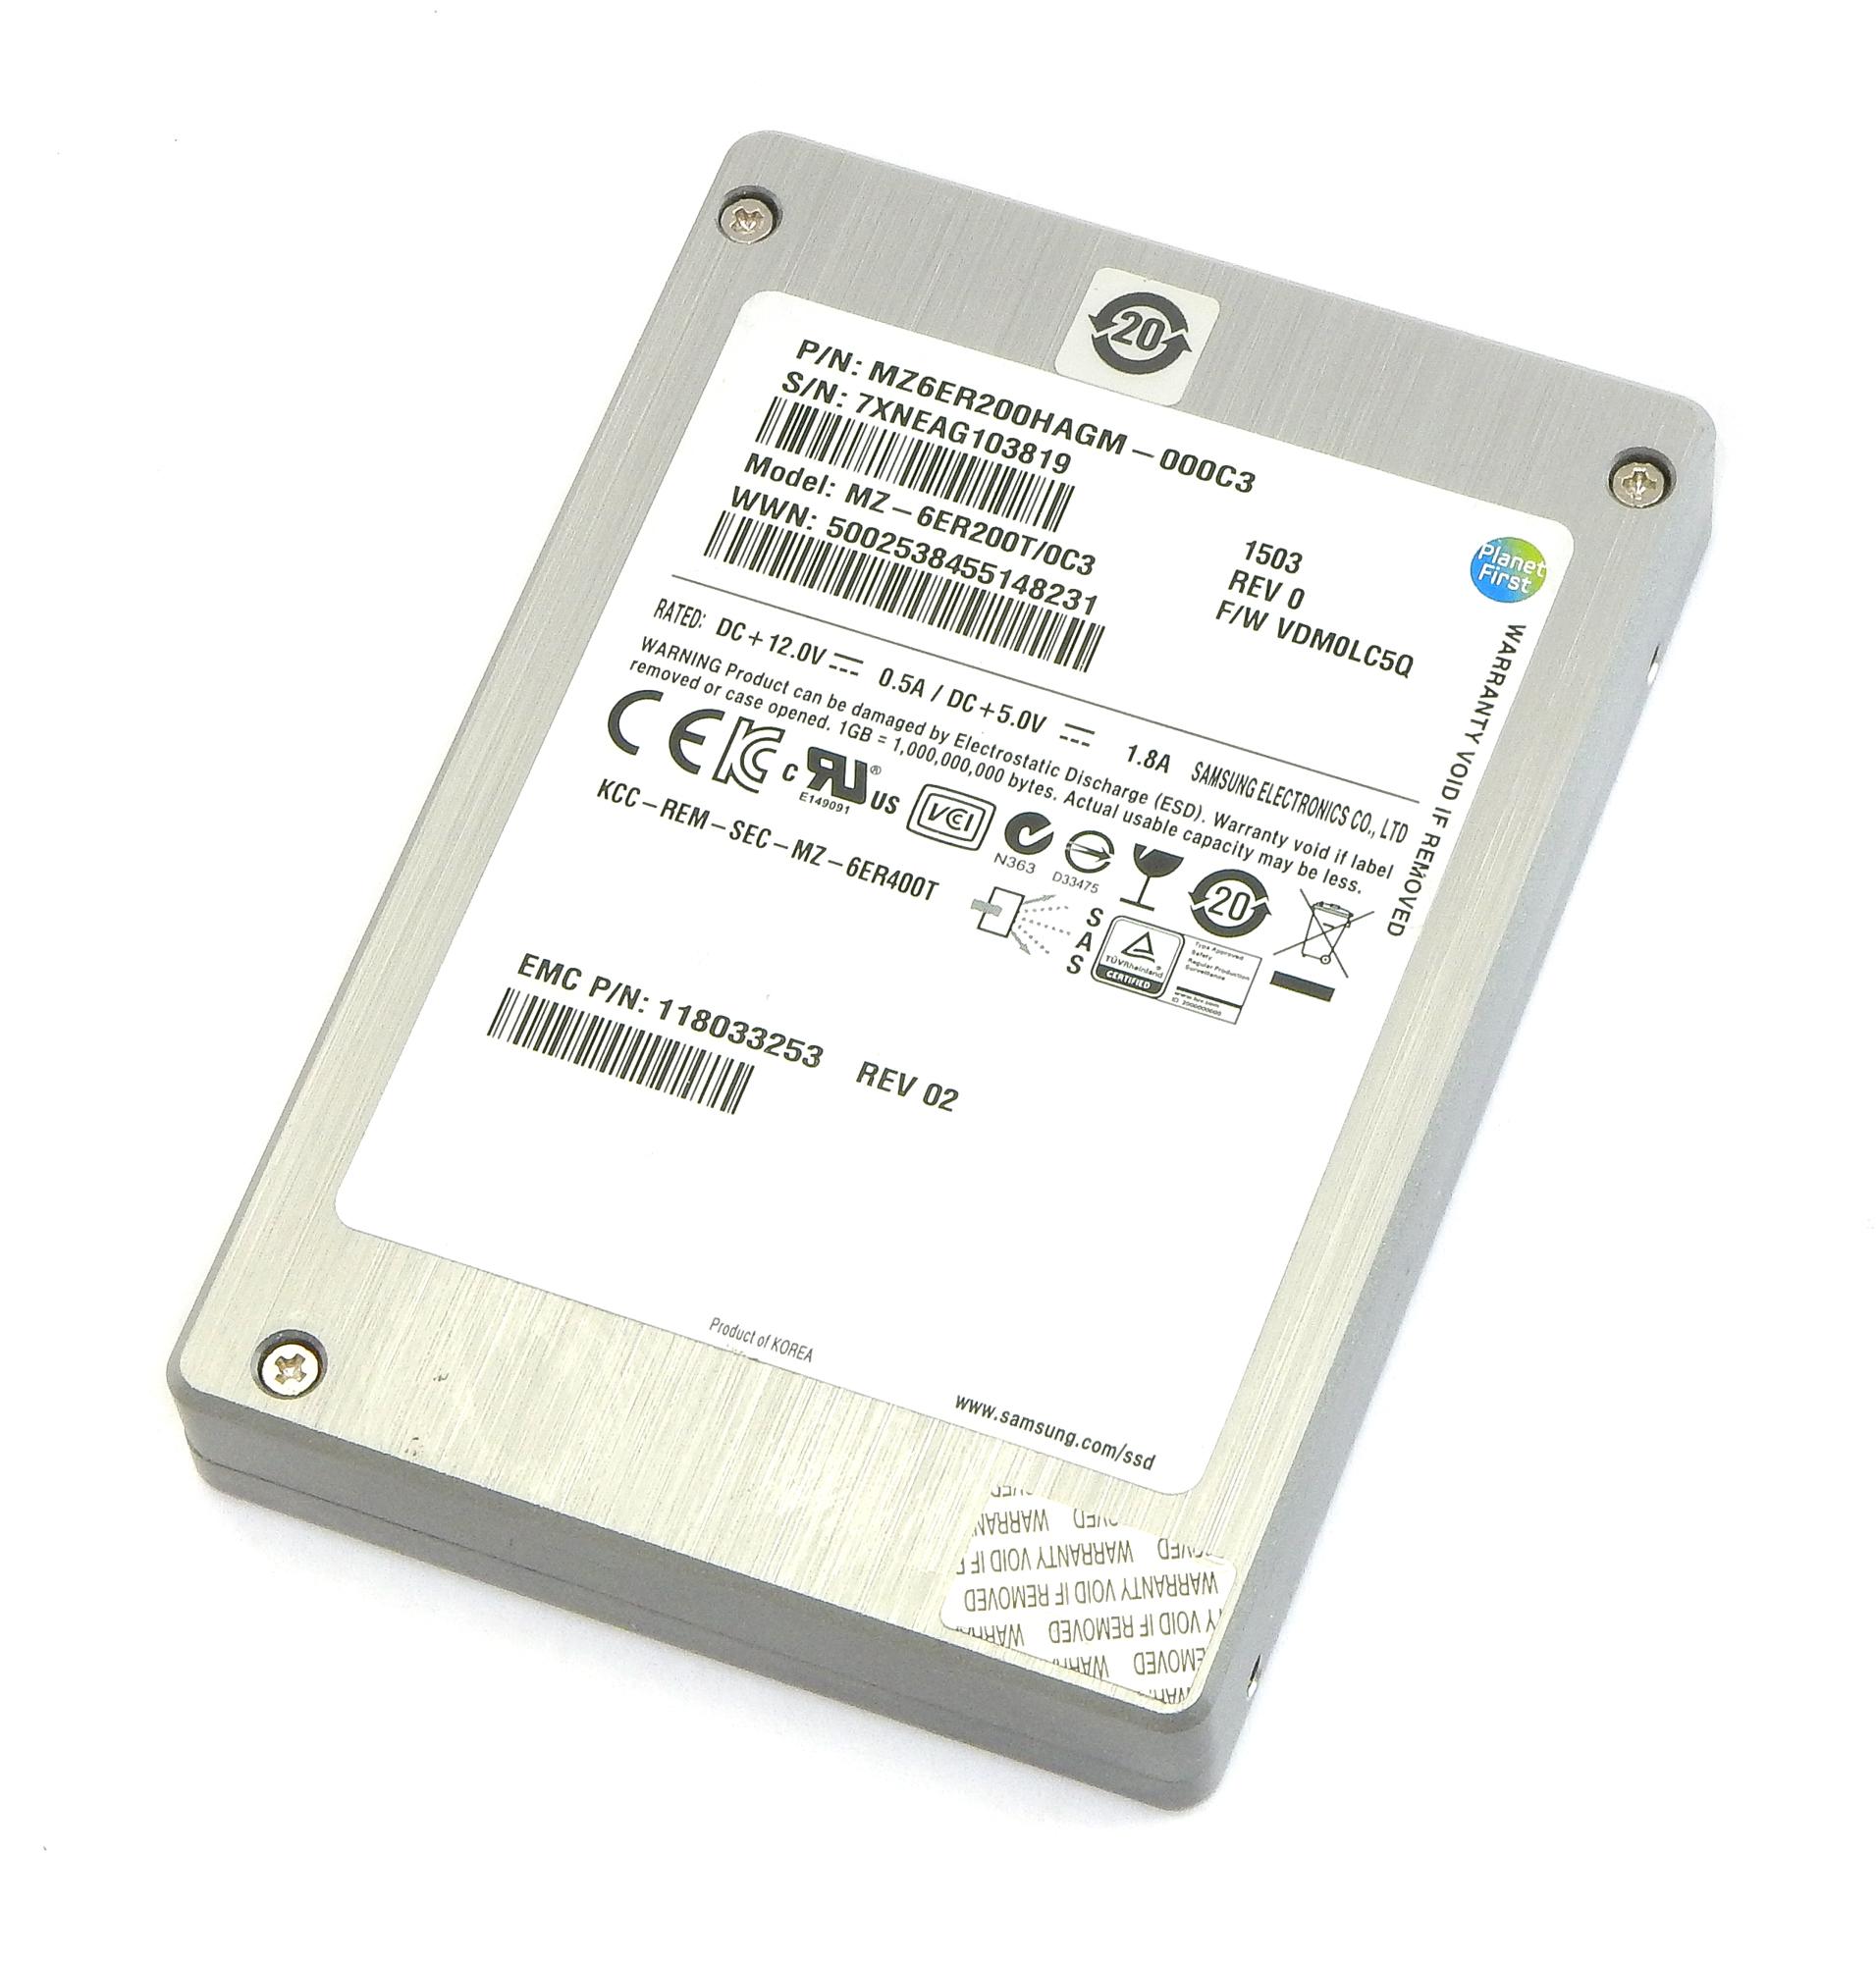 "Samsung MZ-6ER200T/0C3 200GB 2.5"" 6Gbps SAS Enterprise SSD MZ6ER200HAGM-000C3"